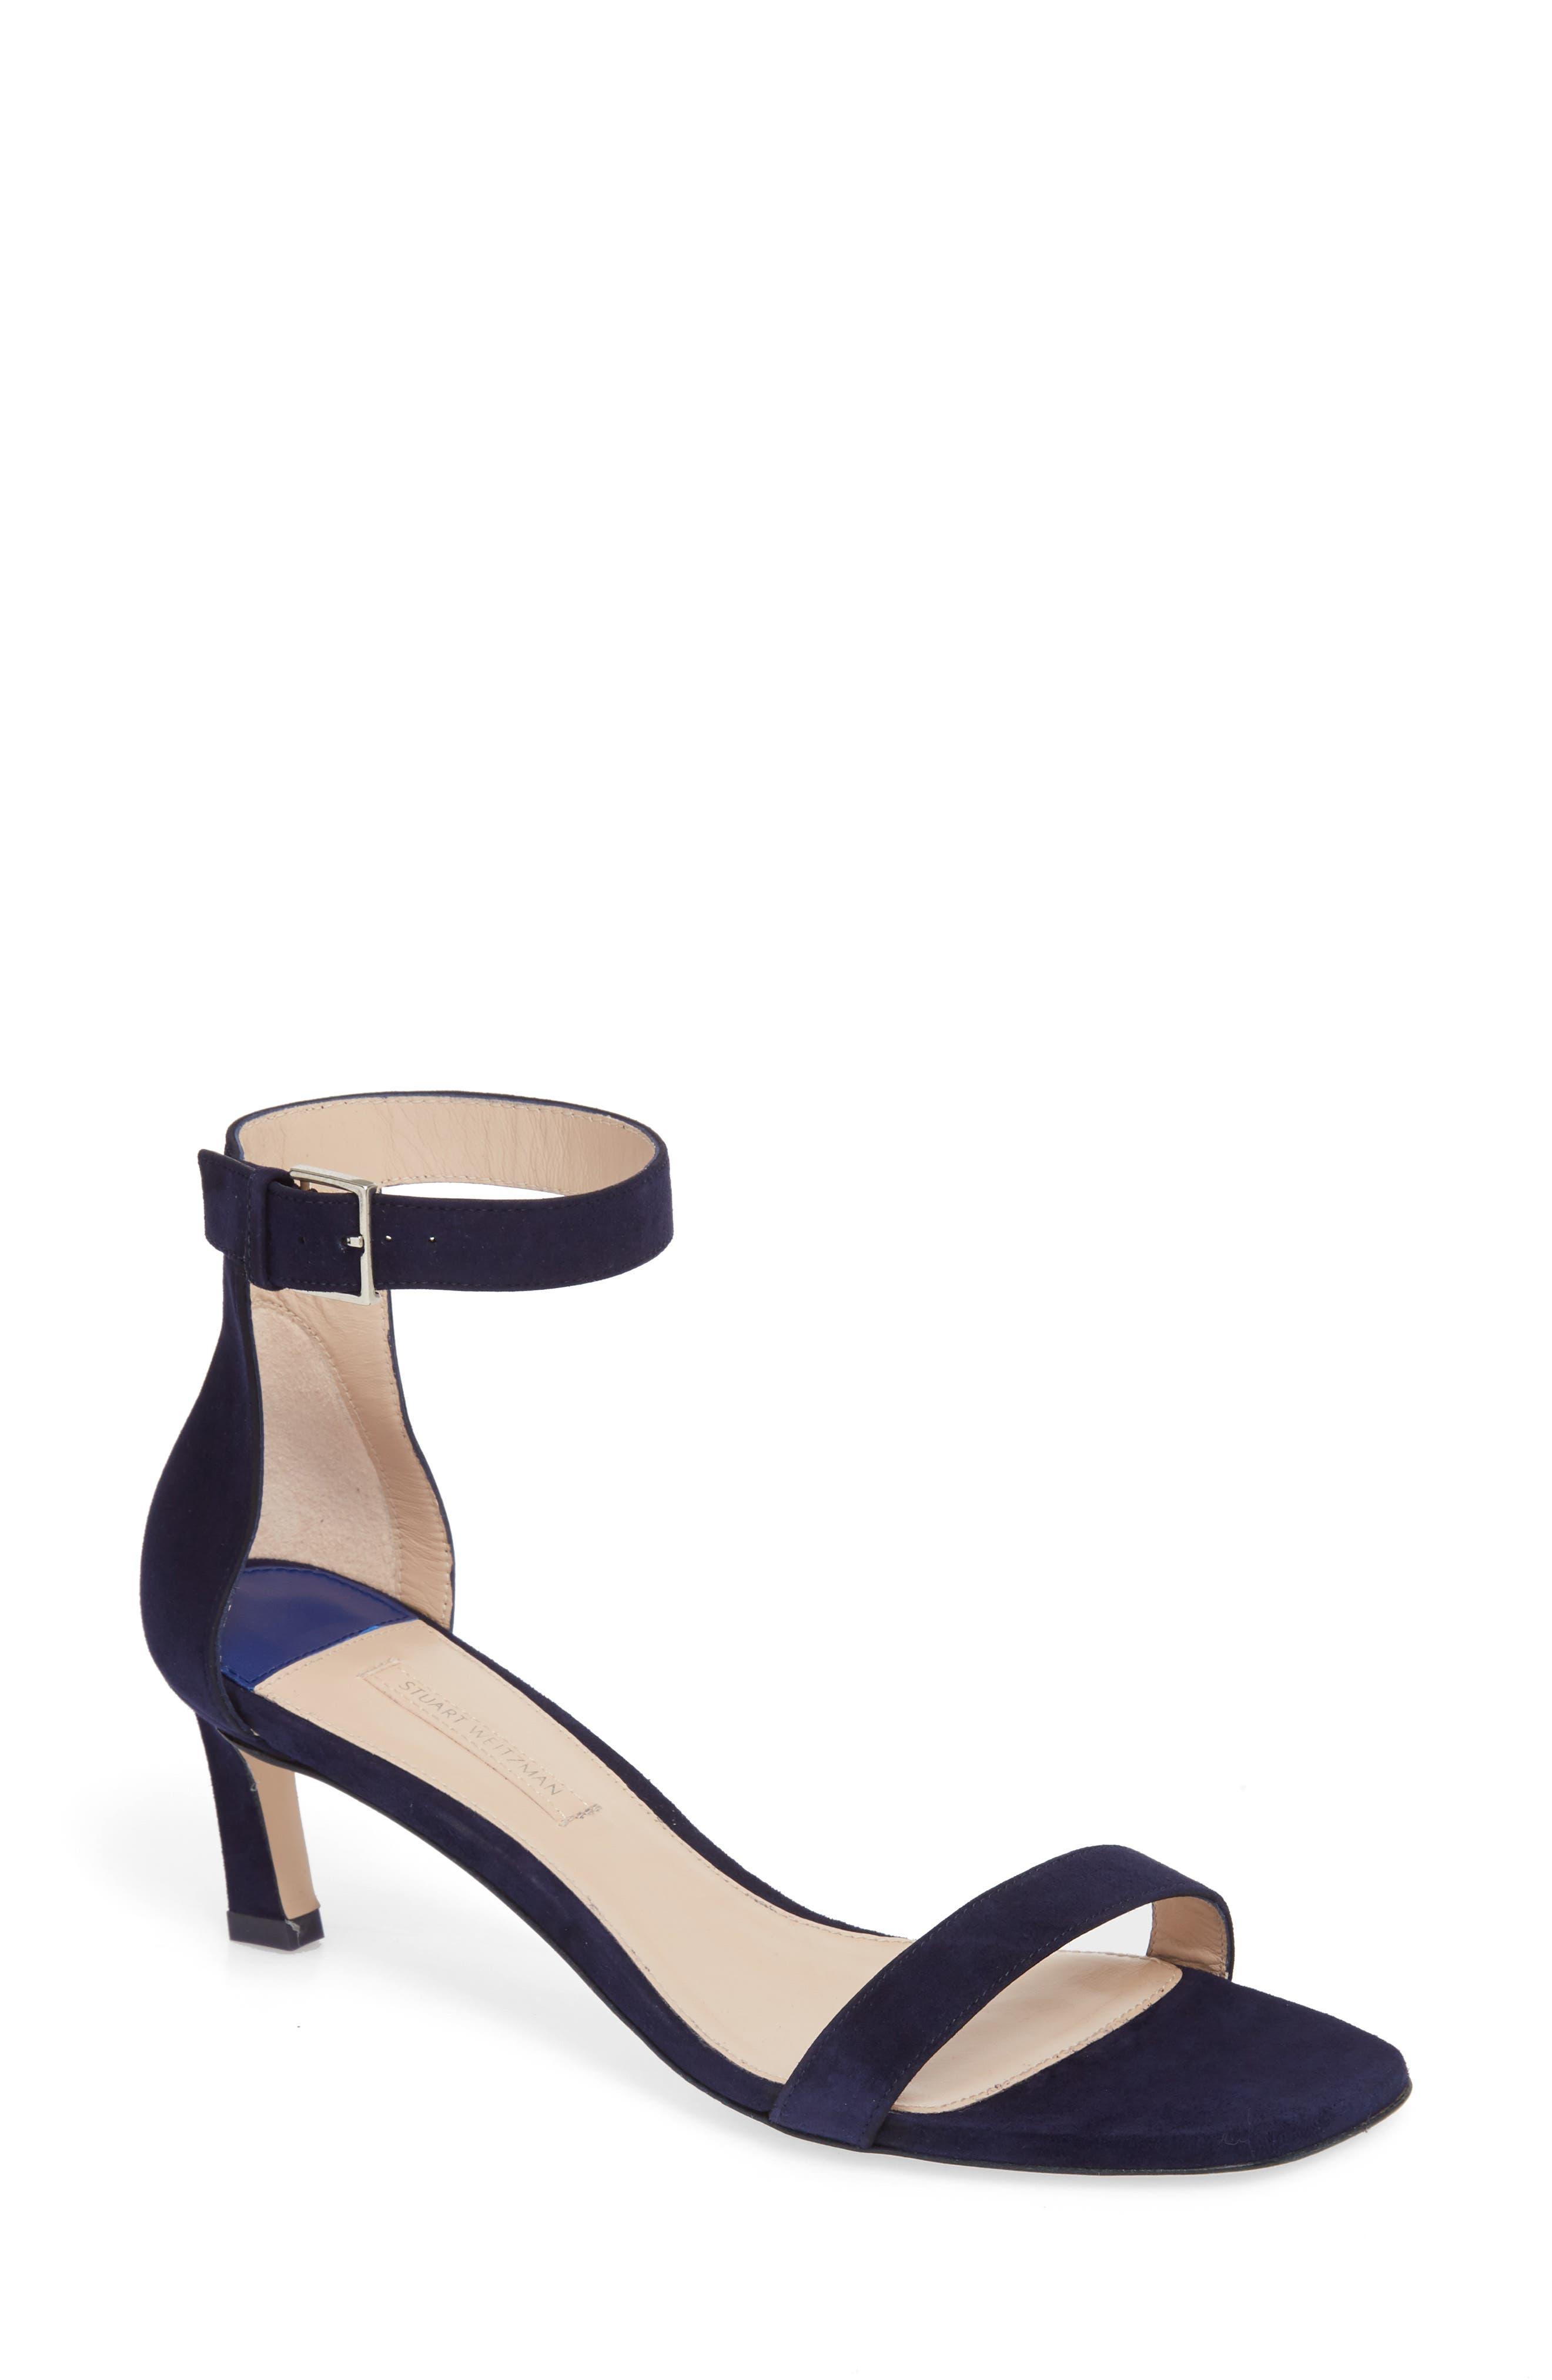 Stuart Weitzman Women's 45Squarenudist Ankle Strap Sandal 8pOB8uyT5E